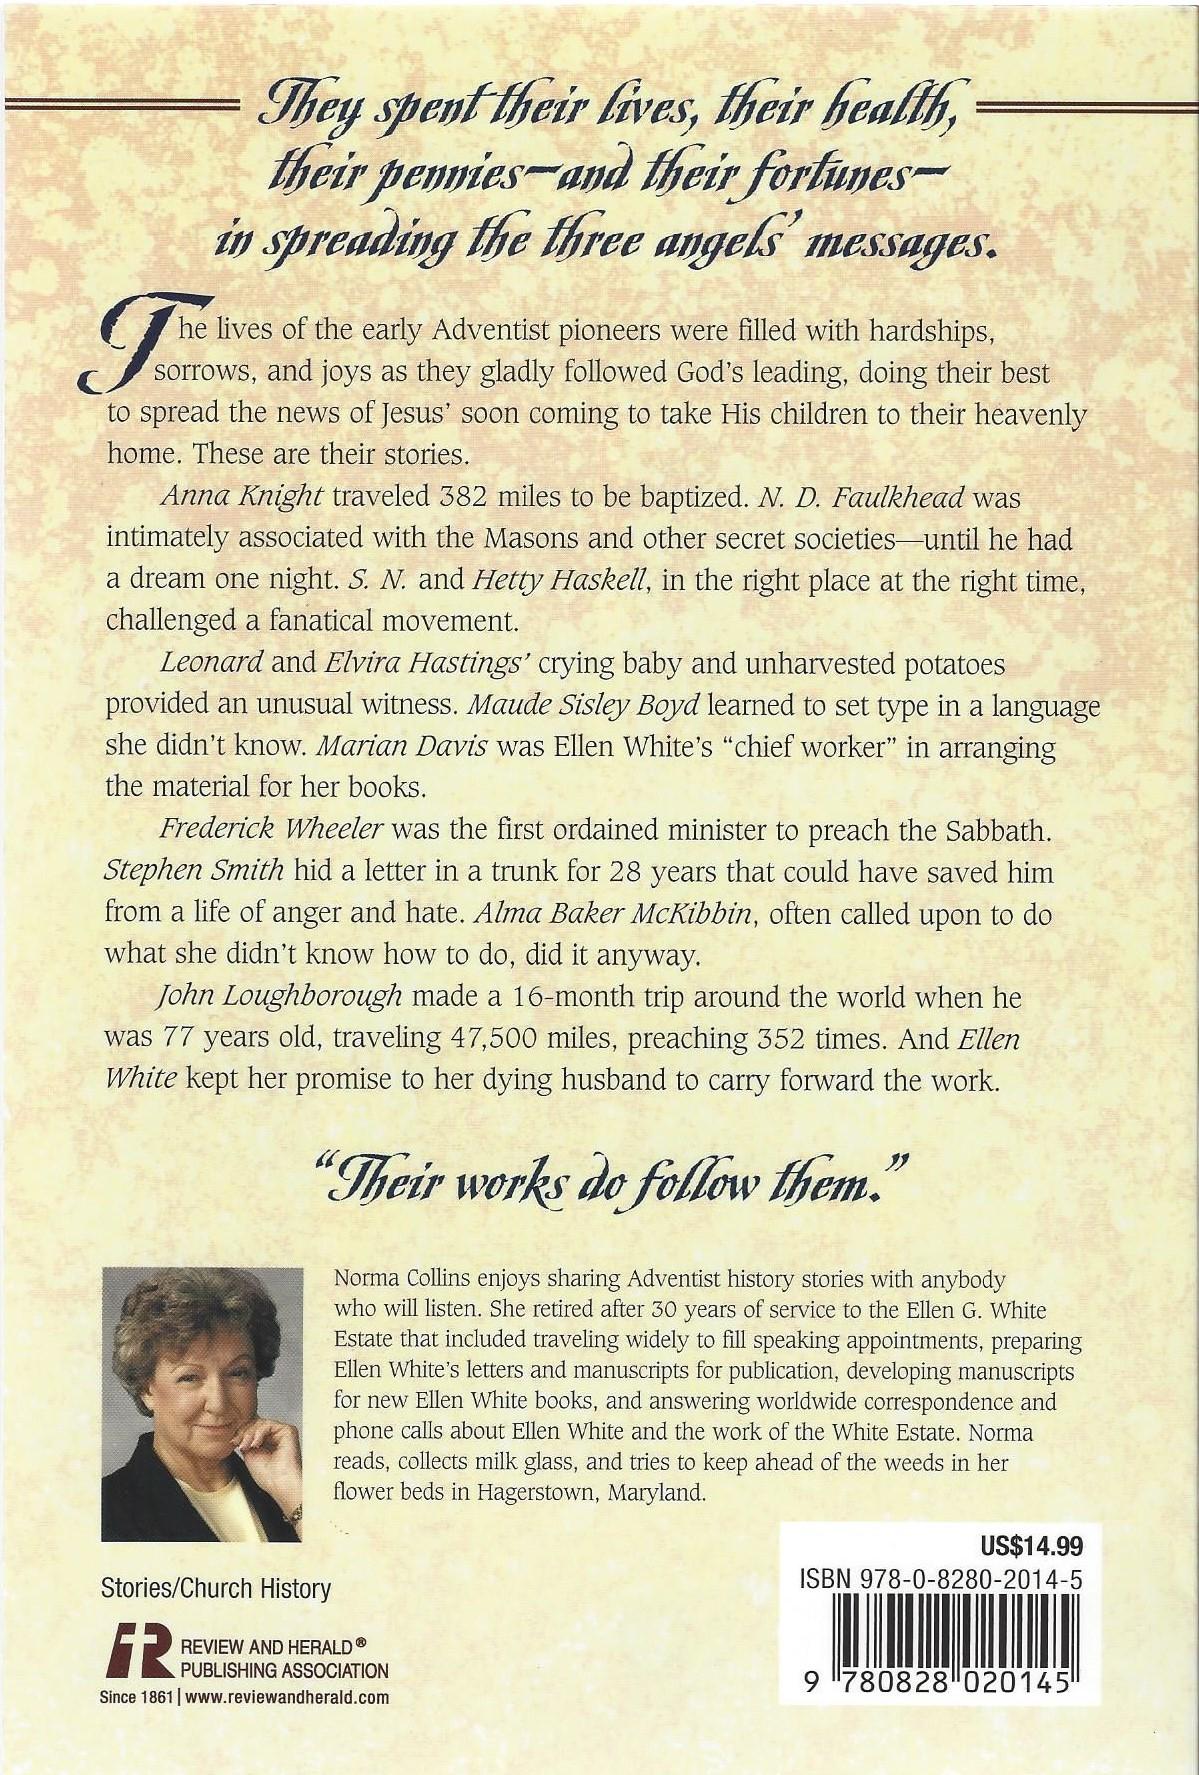 Heartwarming Stories of Adventist Pioneers, Book 2